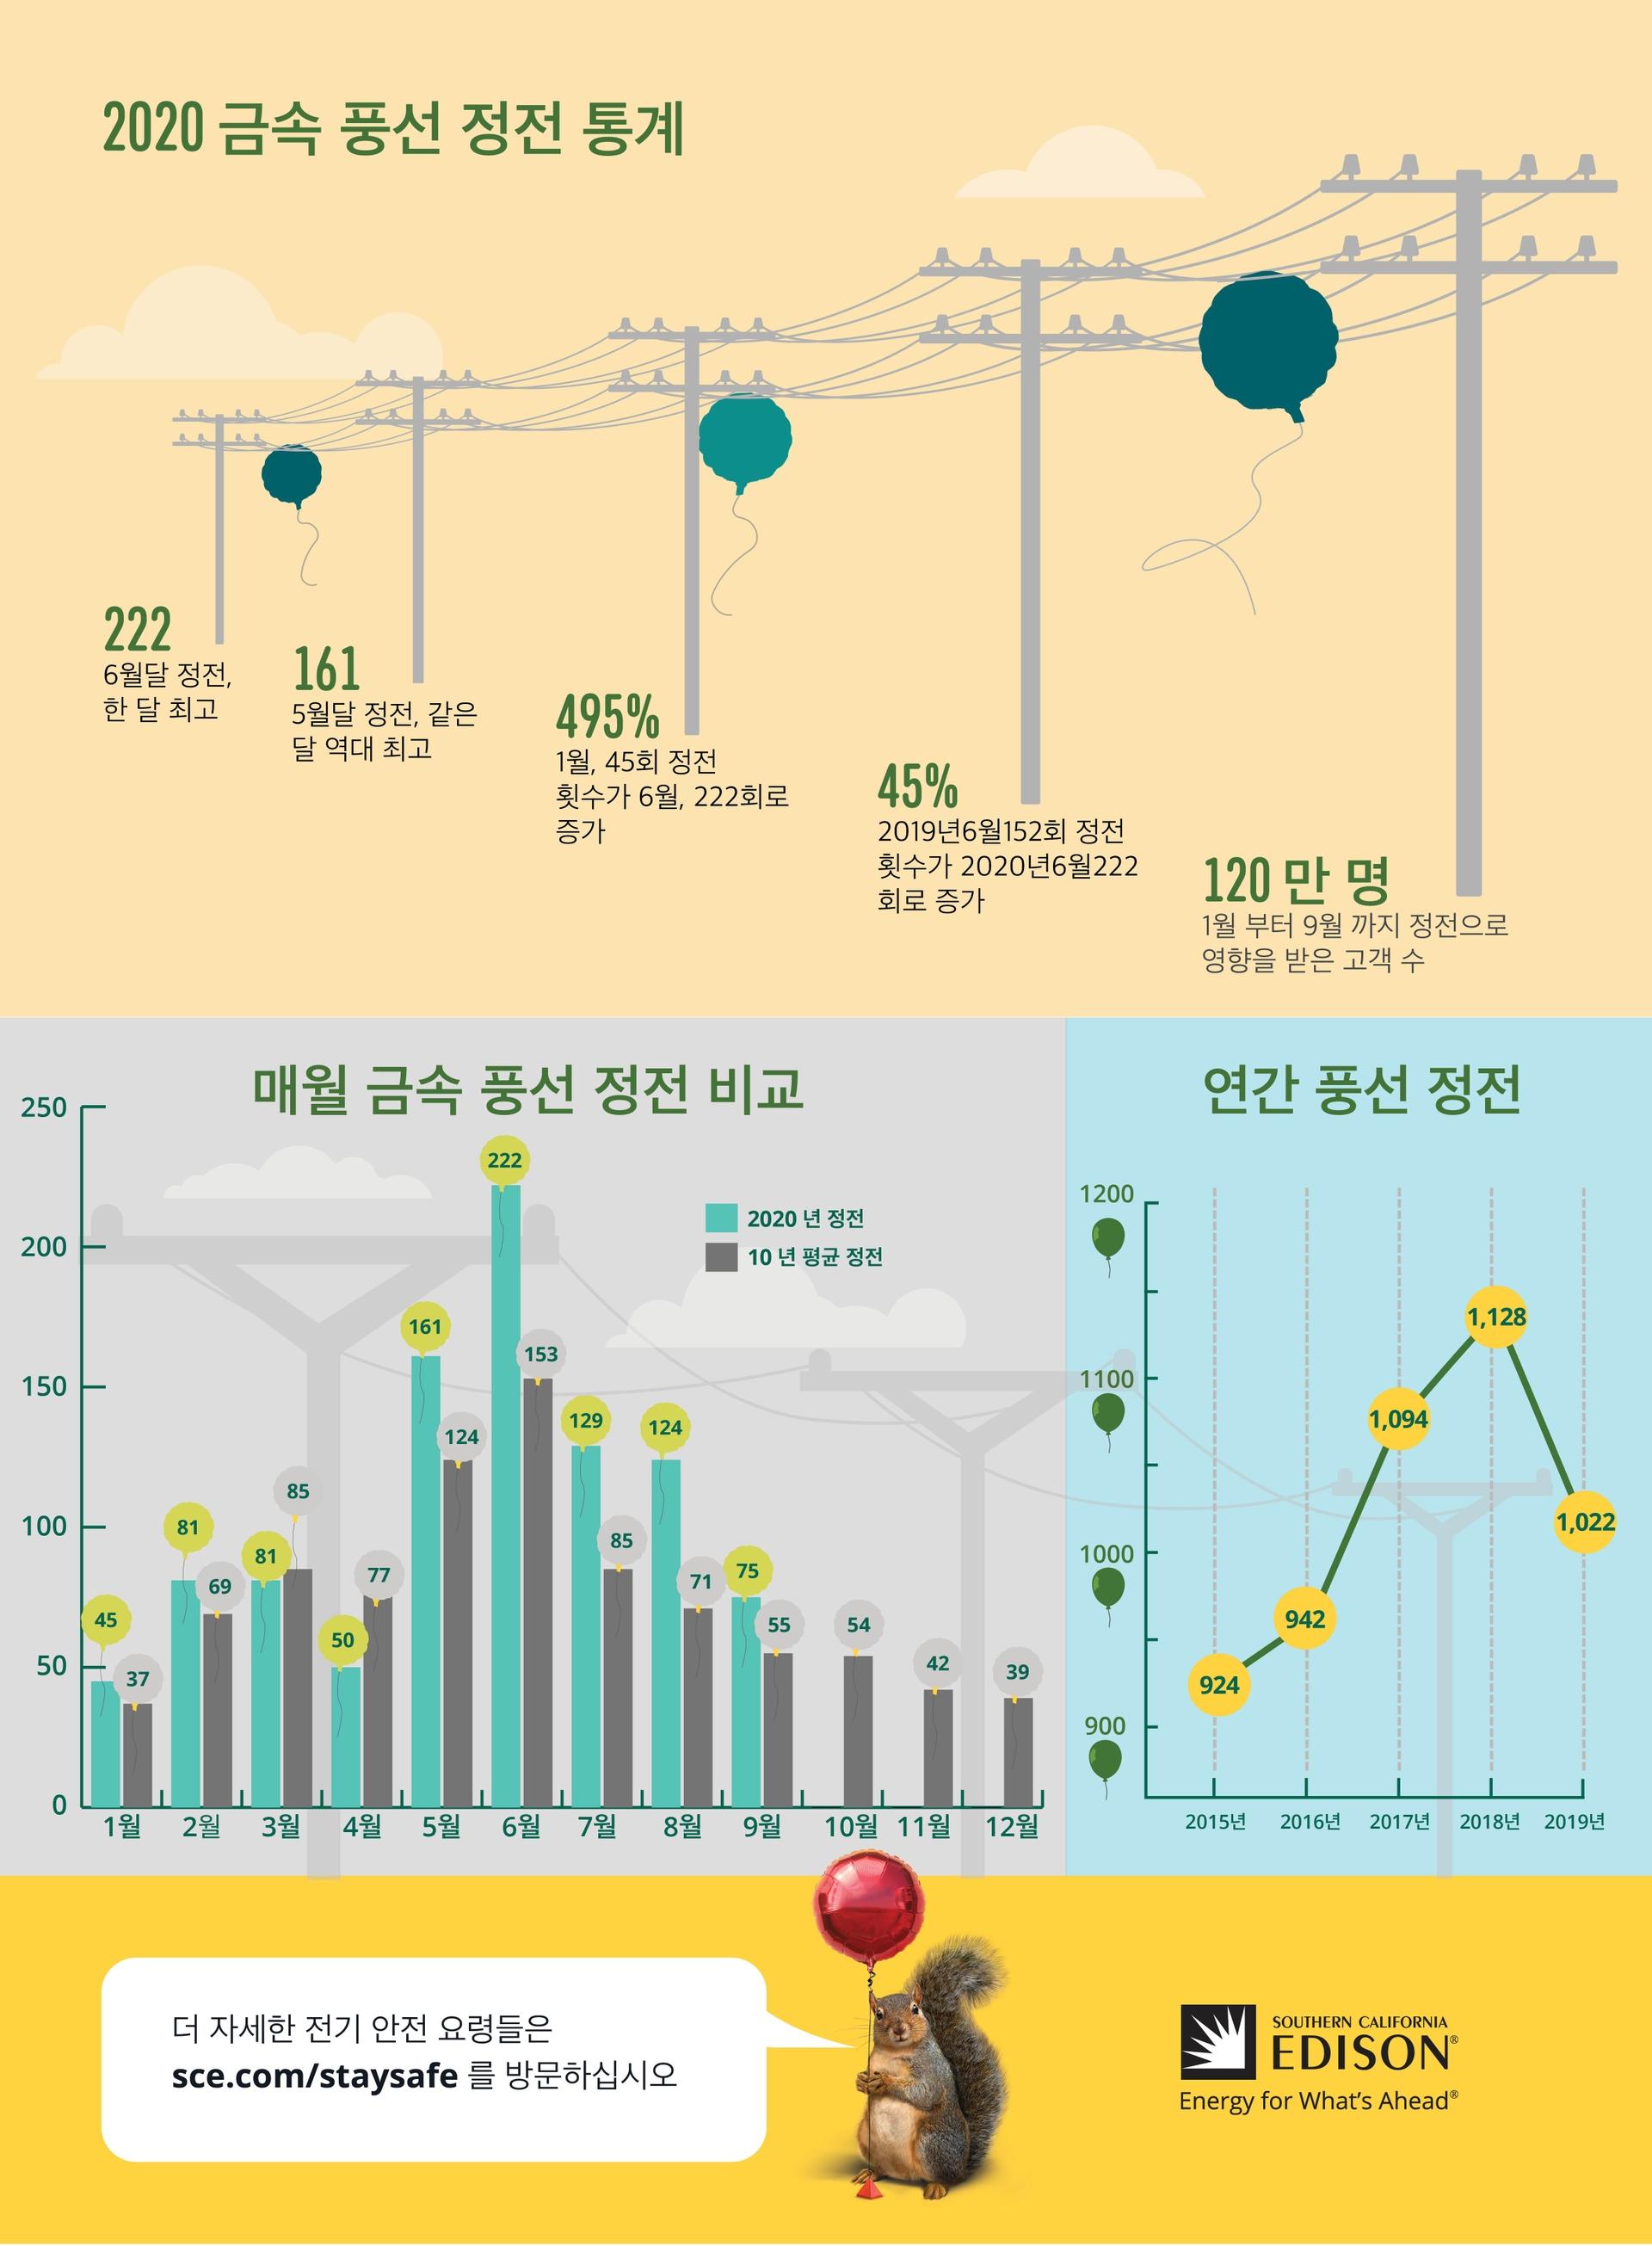 G20-208 Metallic Balloon Infographic_KO